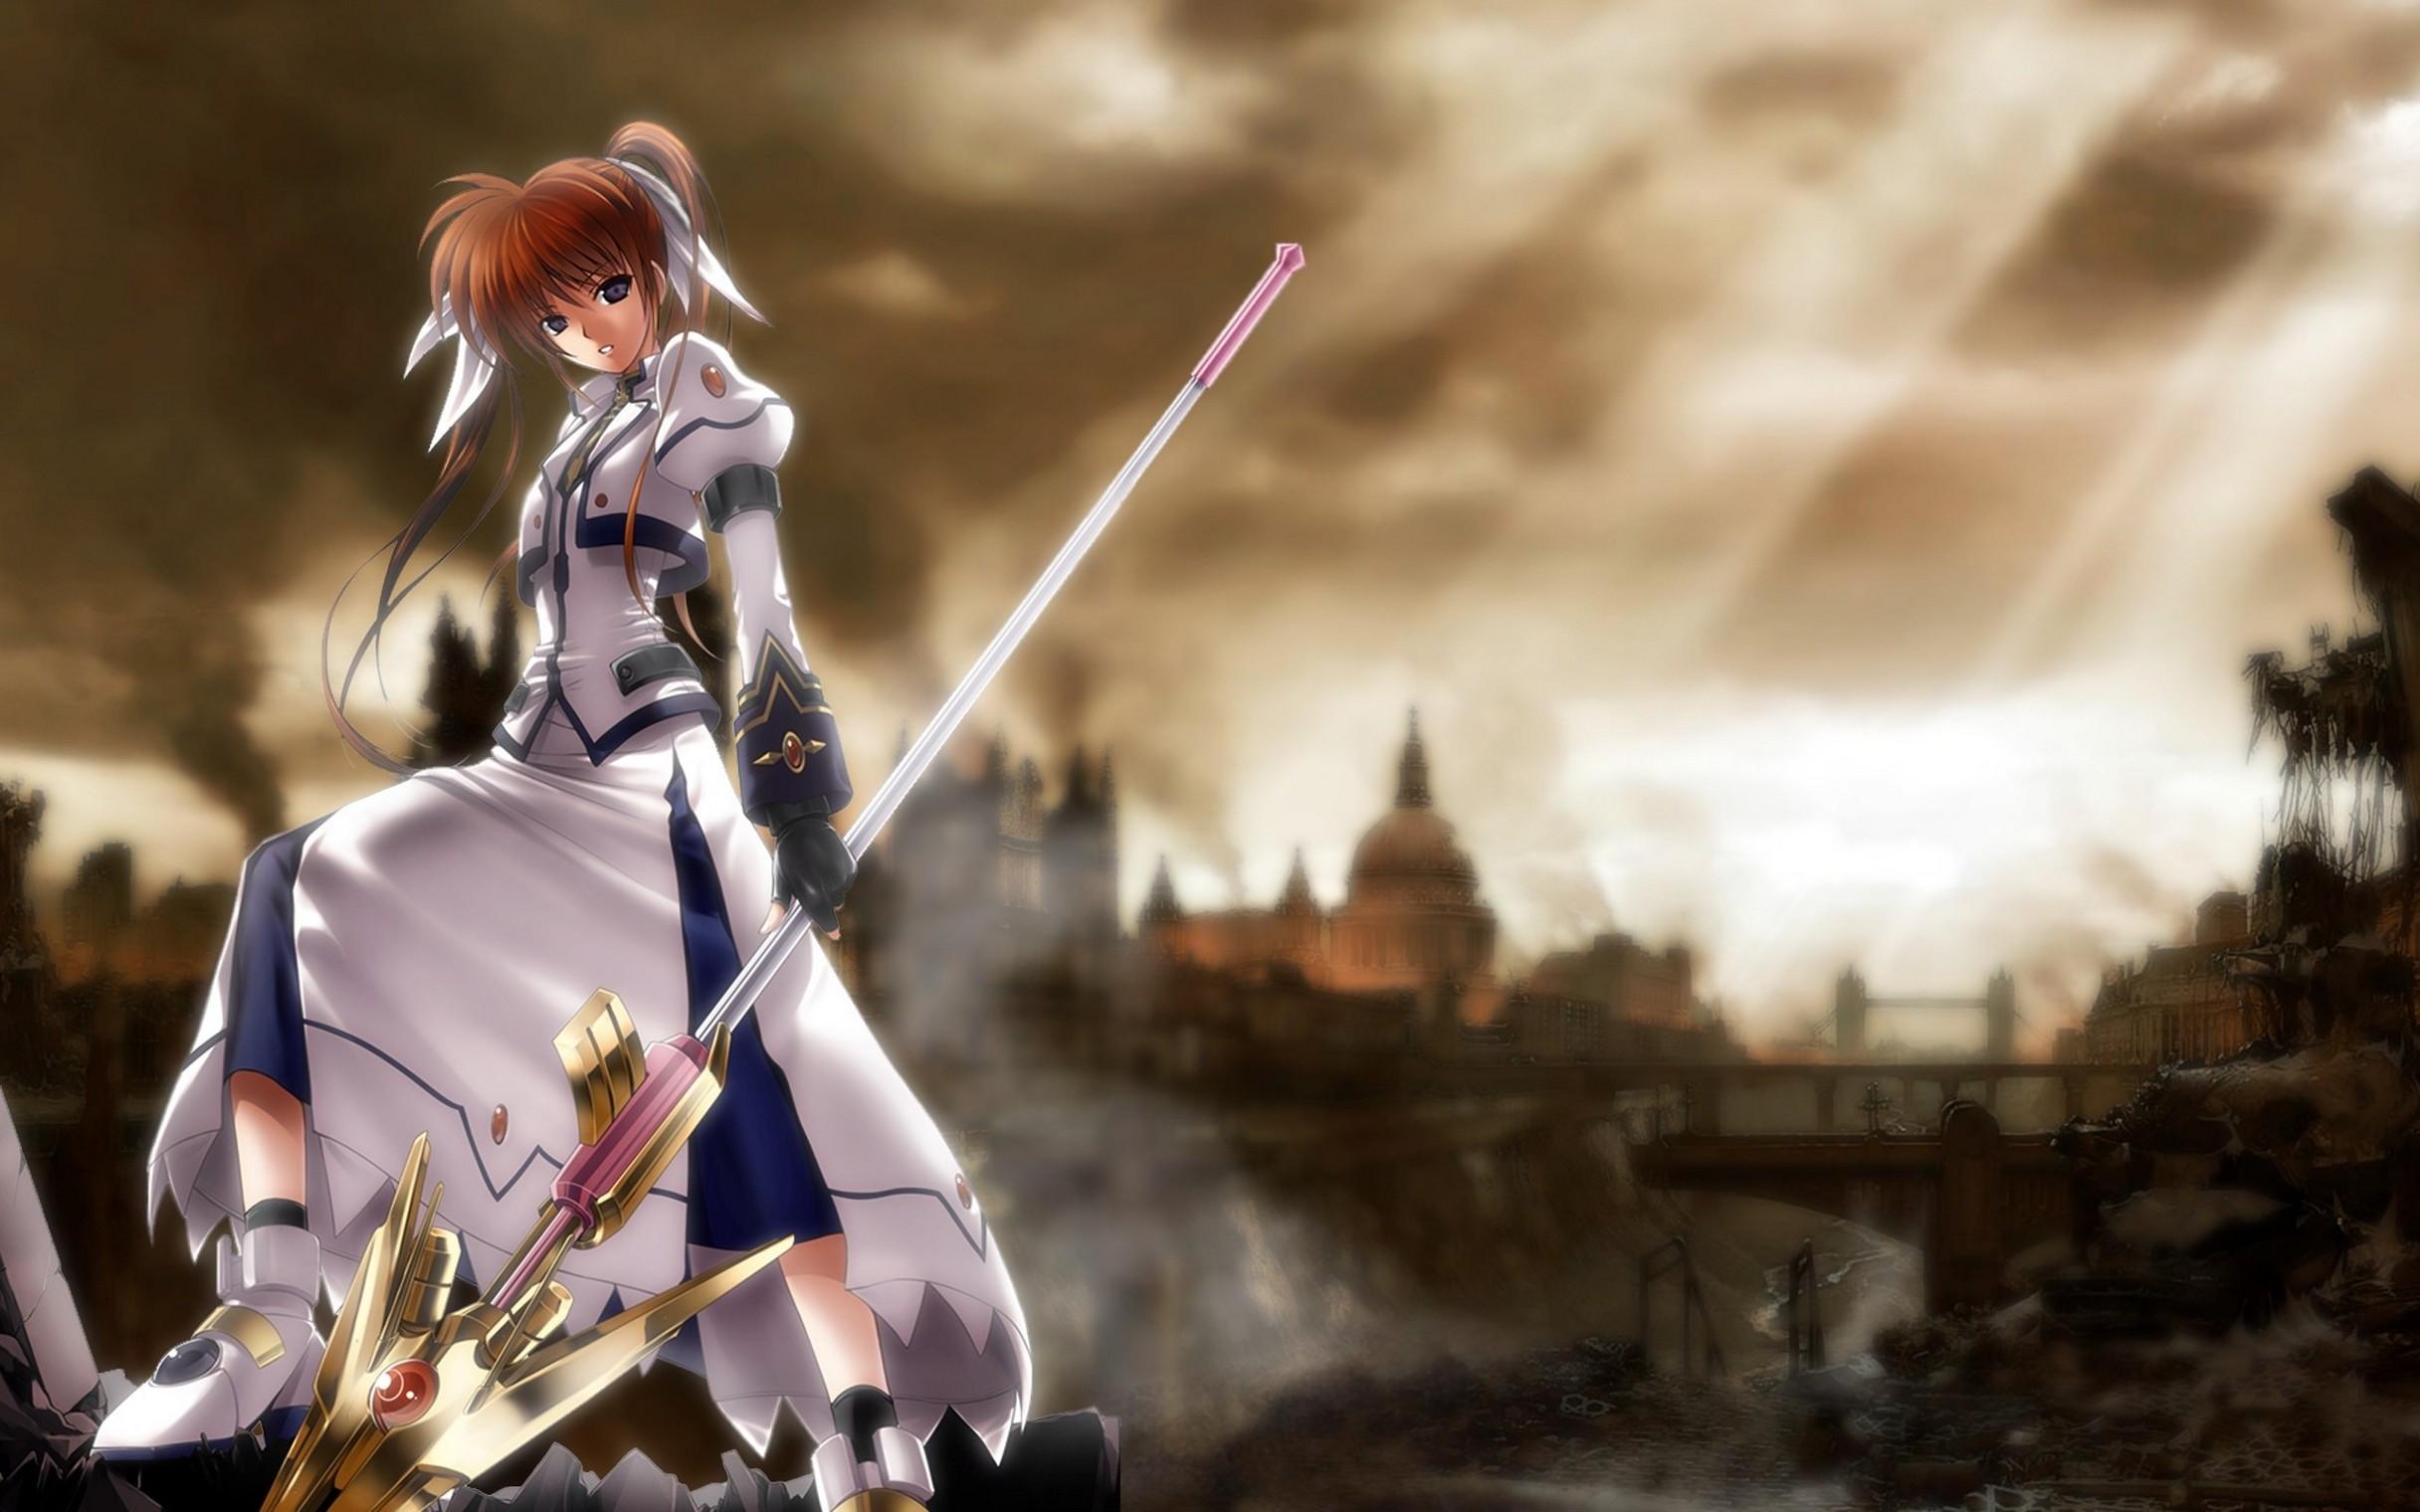 Magical Girl Lyrical Nanoha Girl Gun Landscape Warrior Anime Wild Hd  Wallpaper ASV297